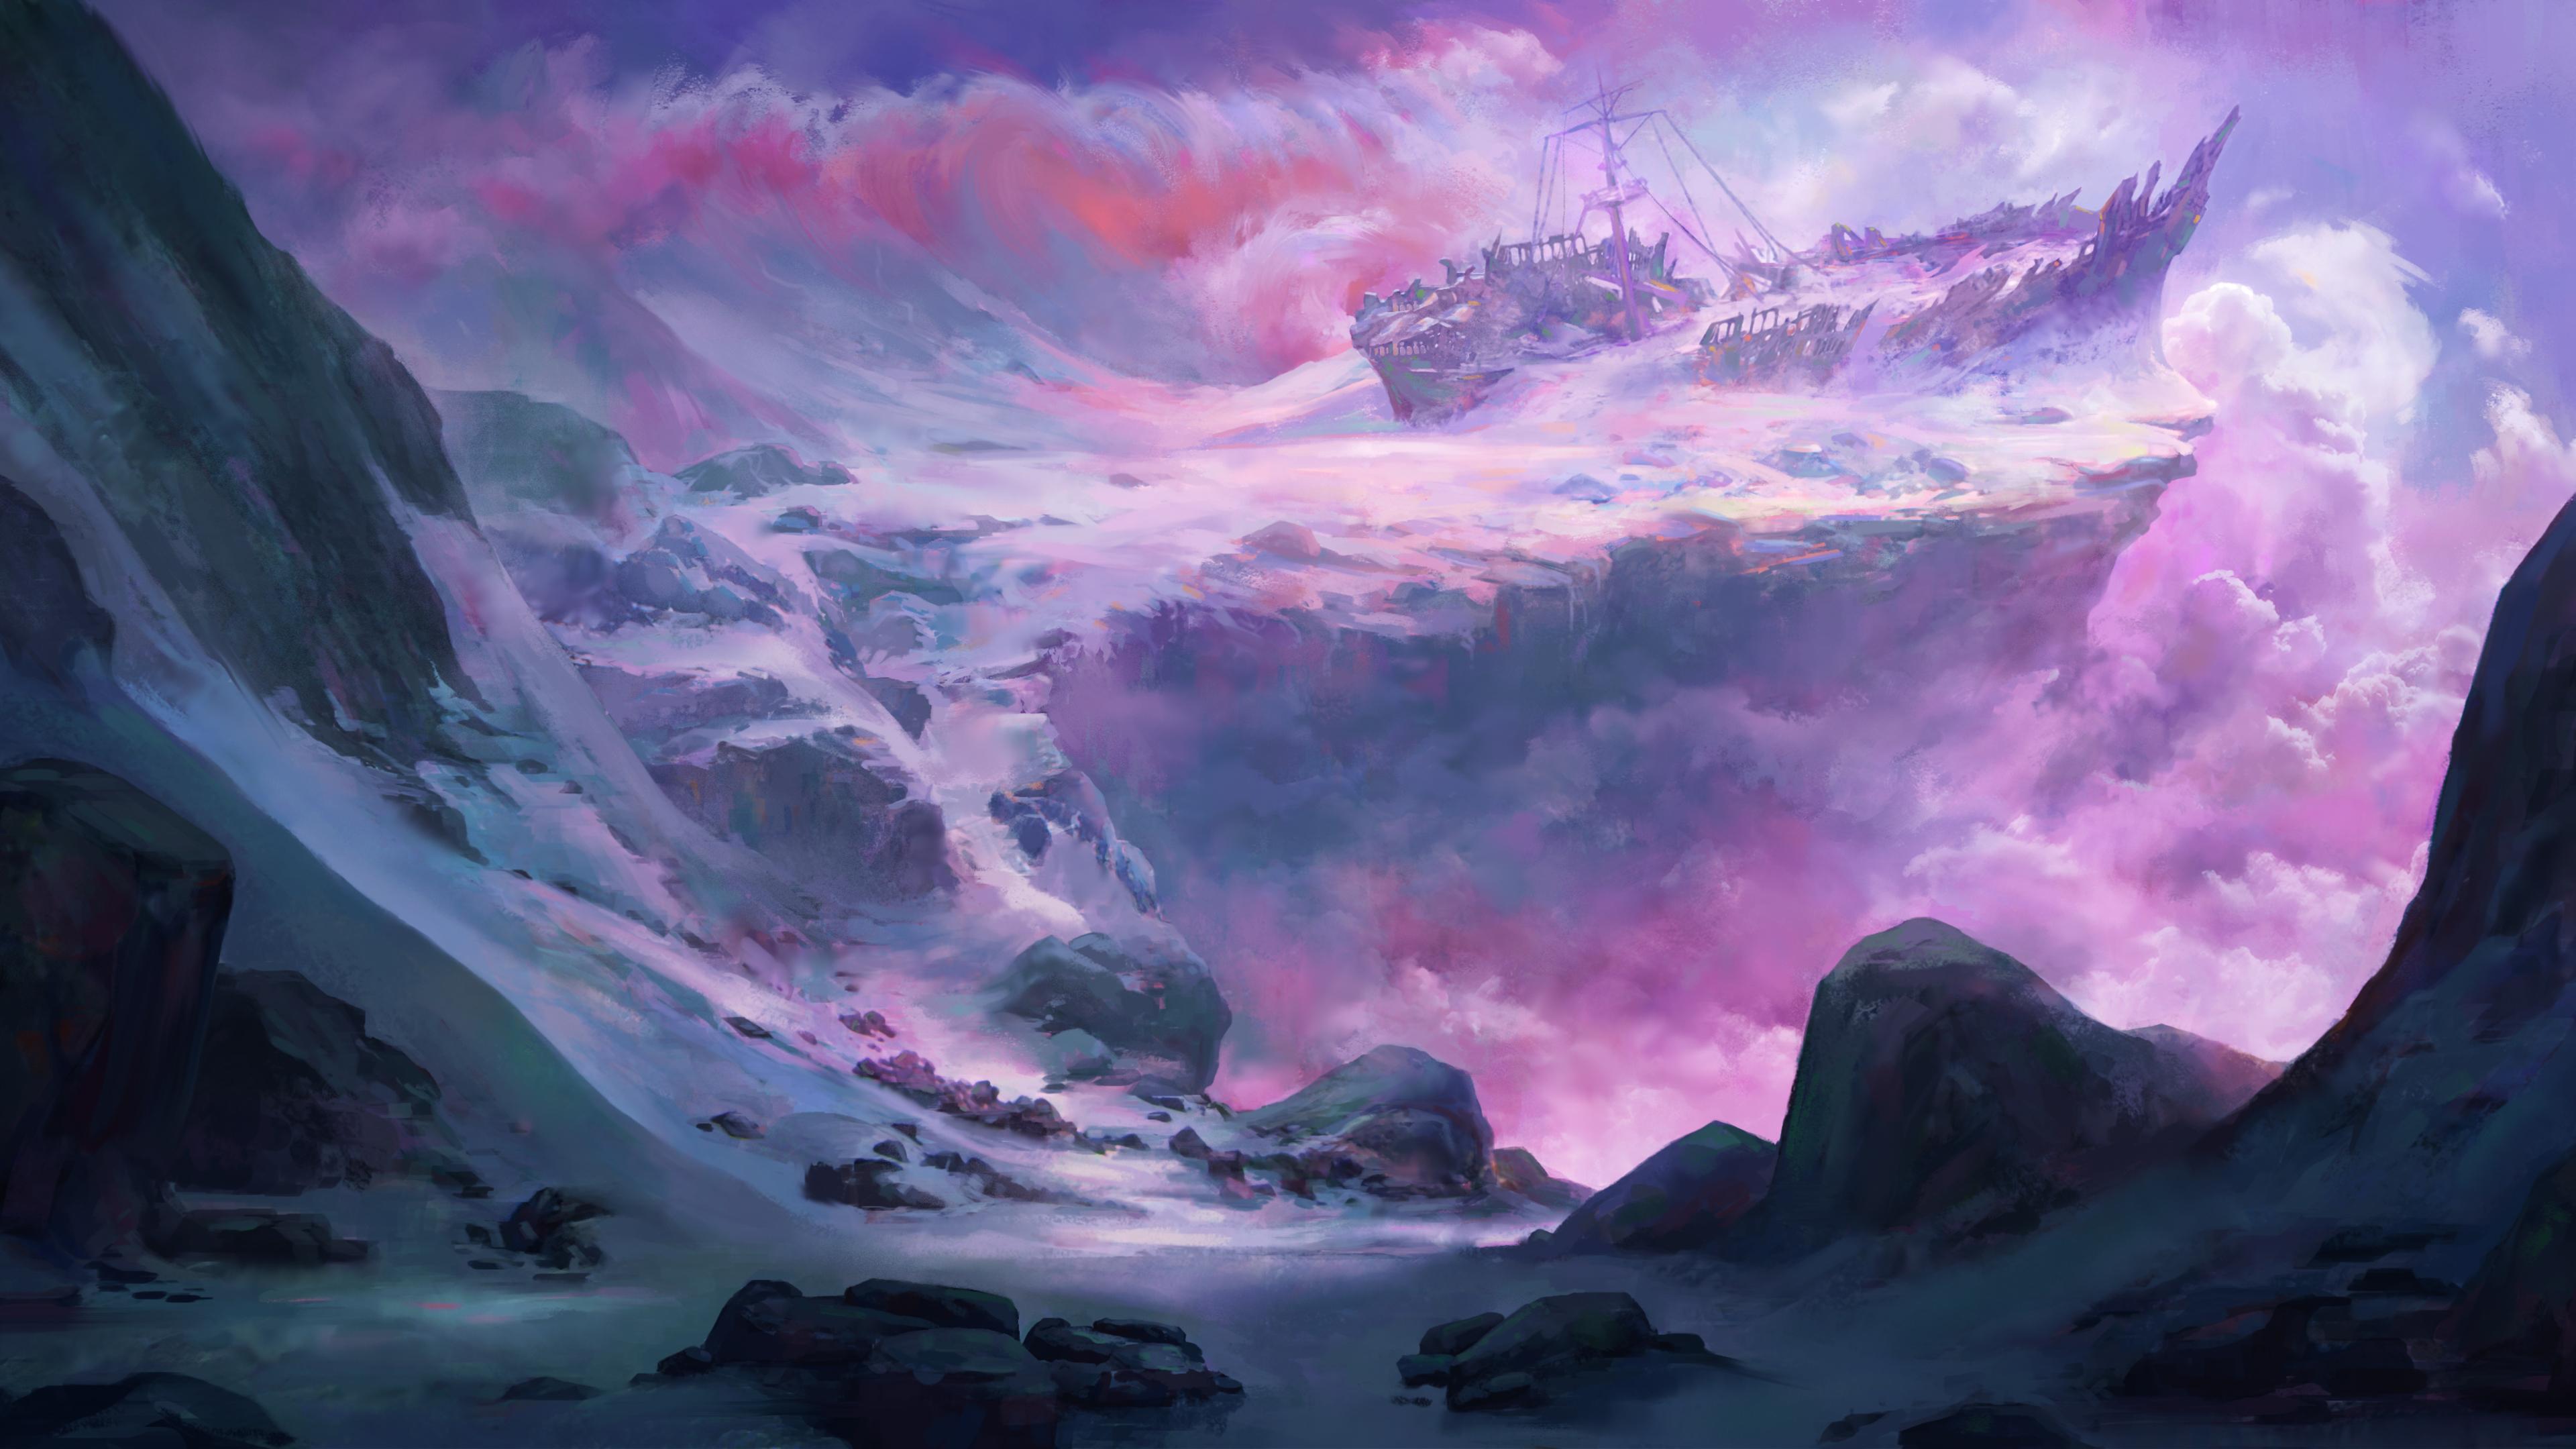 shipwrecked snow scenery 4k 1560535293 - Shipwrecked Snow Scenery 4k - hd-wallpapers, digital art wallpapers, deviantart wallpapers, artwork wallpapers, artist wallpapers, 4k-wallpapers